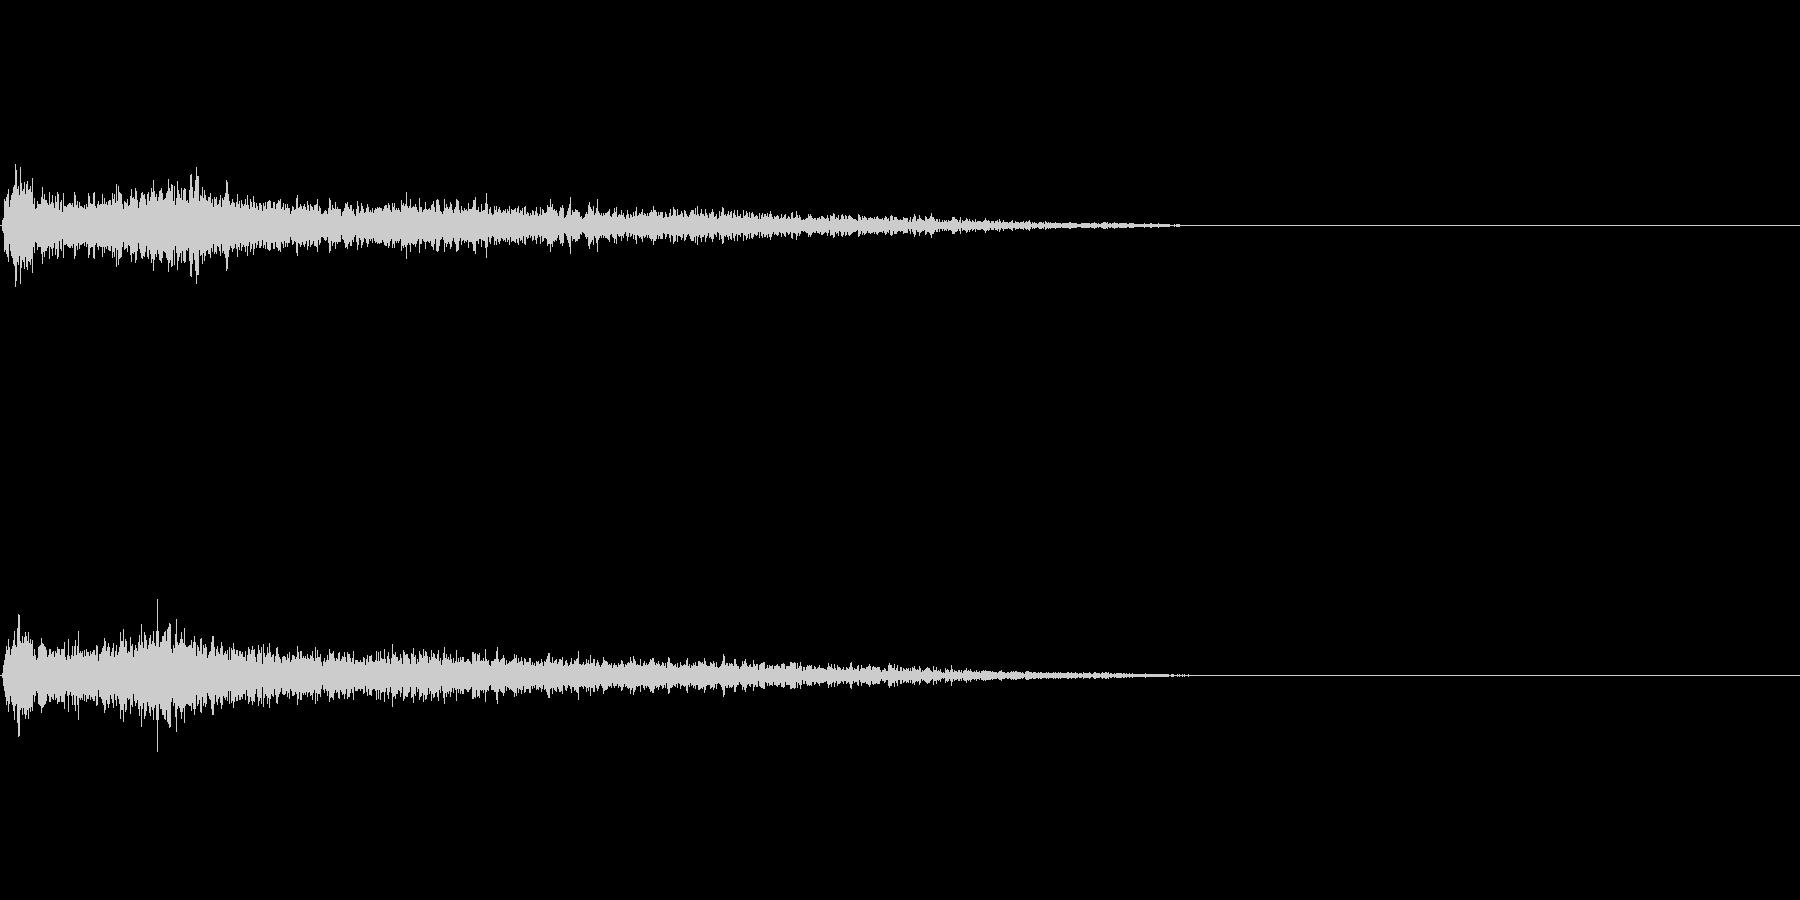 Cマイナー インパクト音 衝撃音の未再生の波形